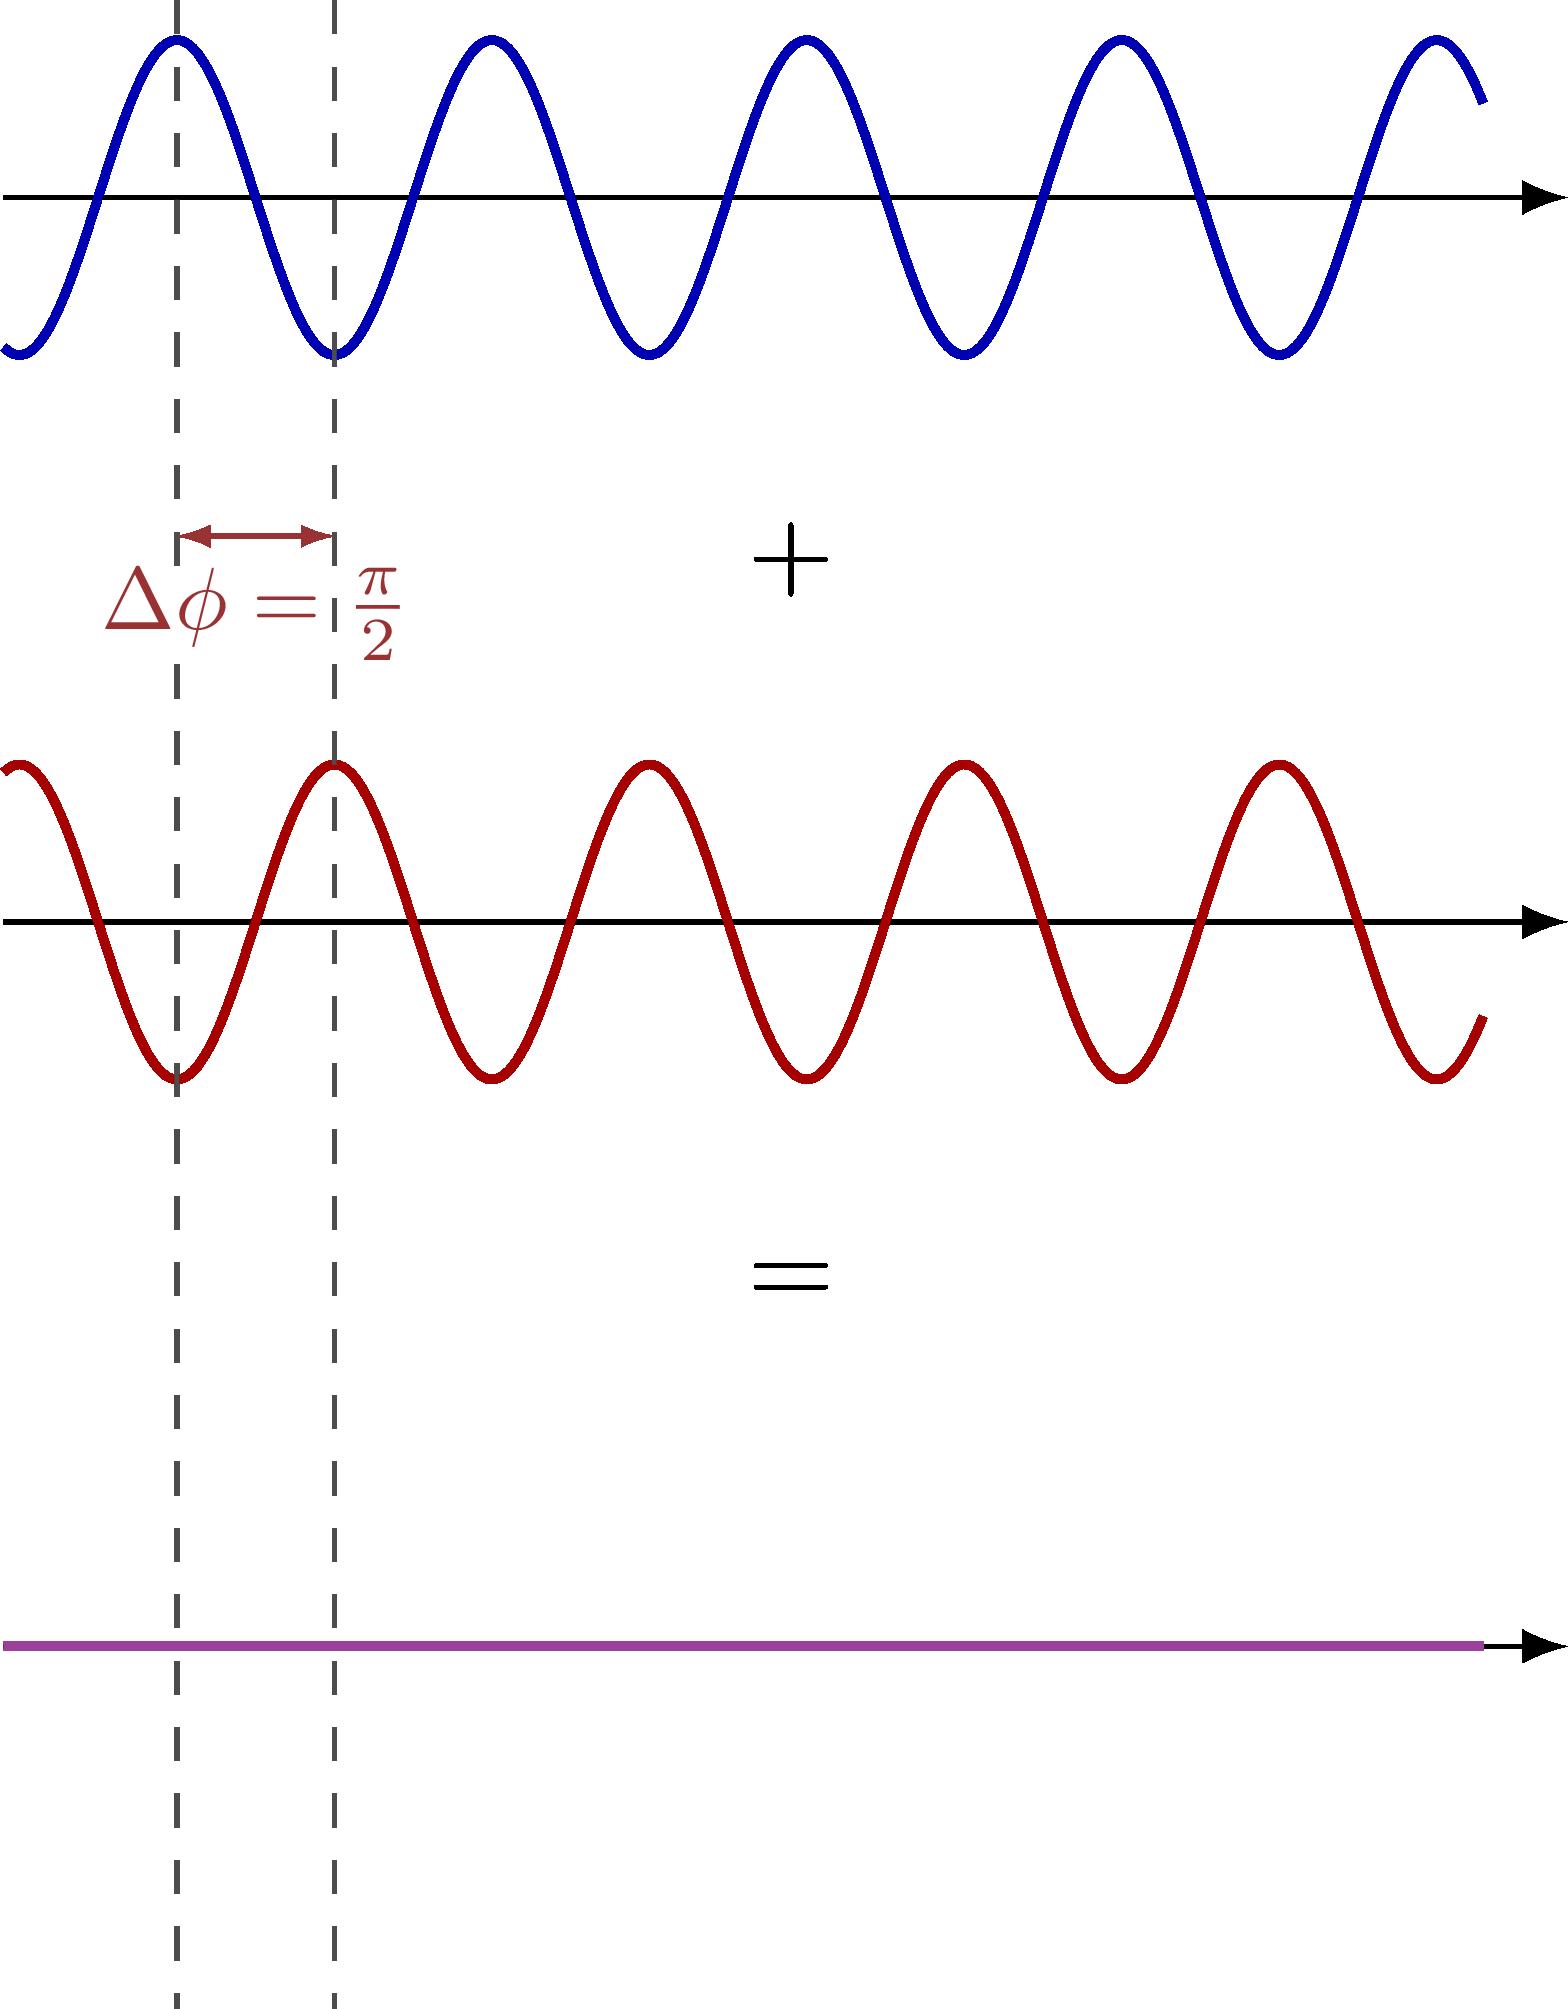 optics_interference-001.png